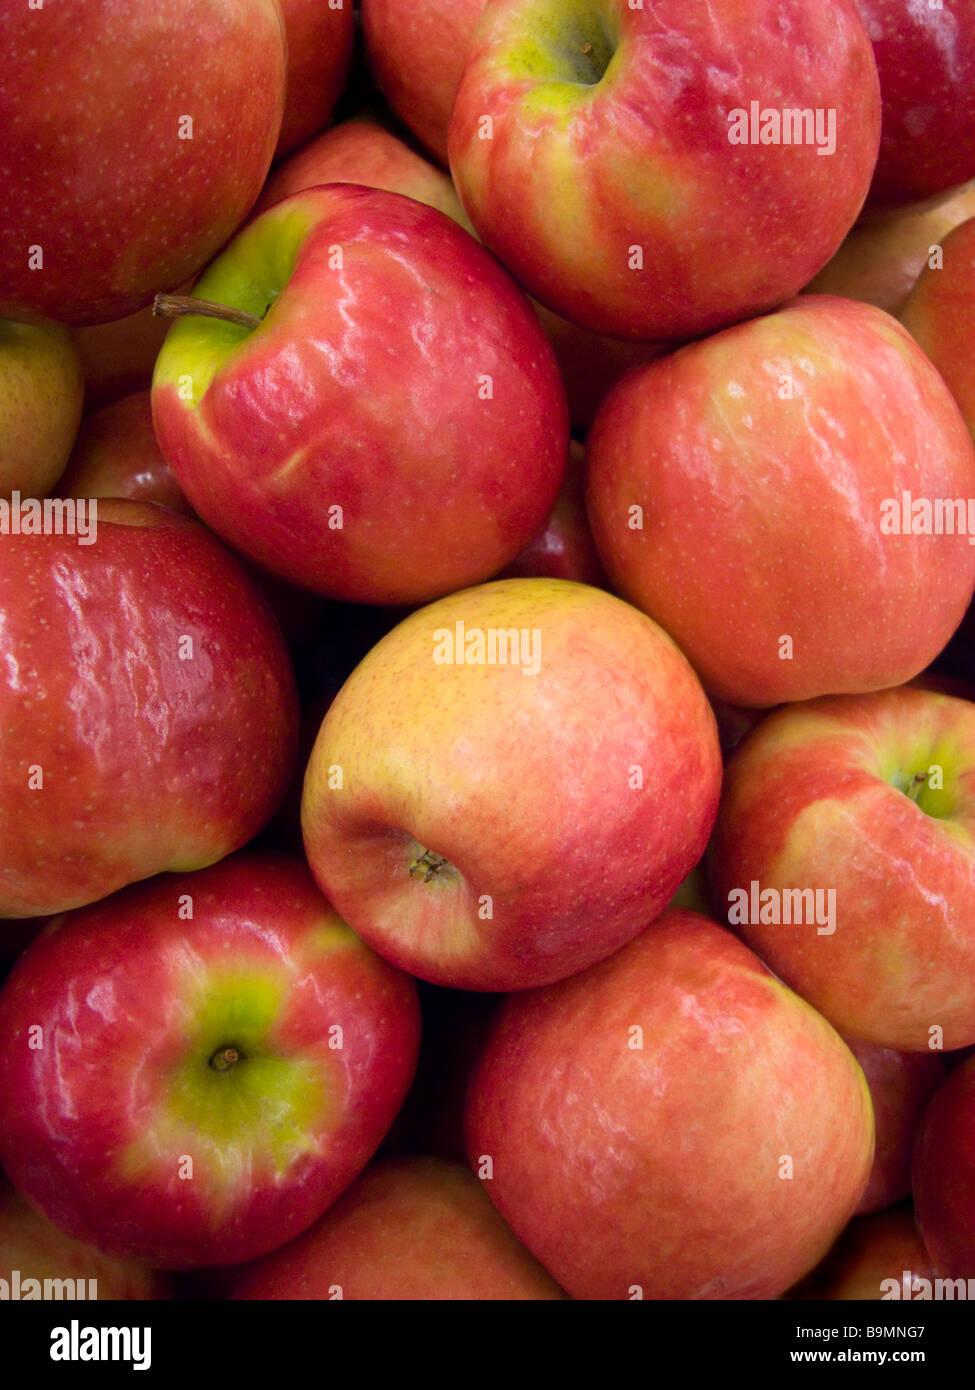 Pile of Braeburn Apples on sale at food market Seattle Washington USA - Stock Image